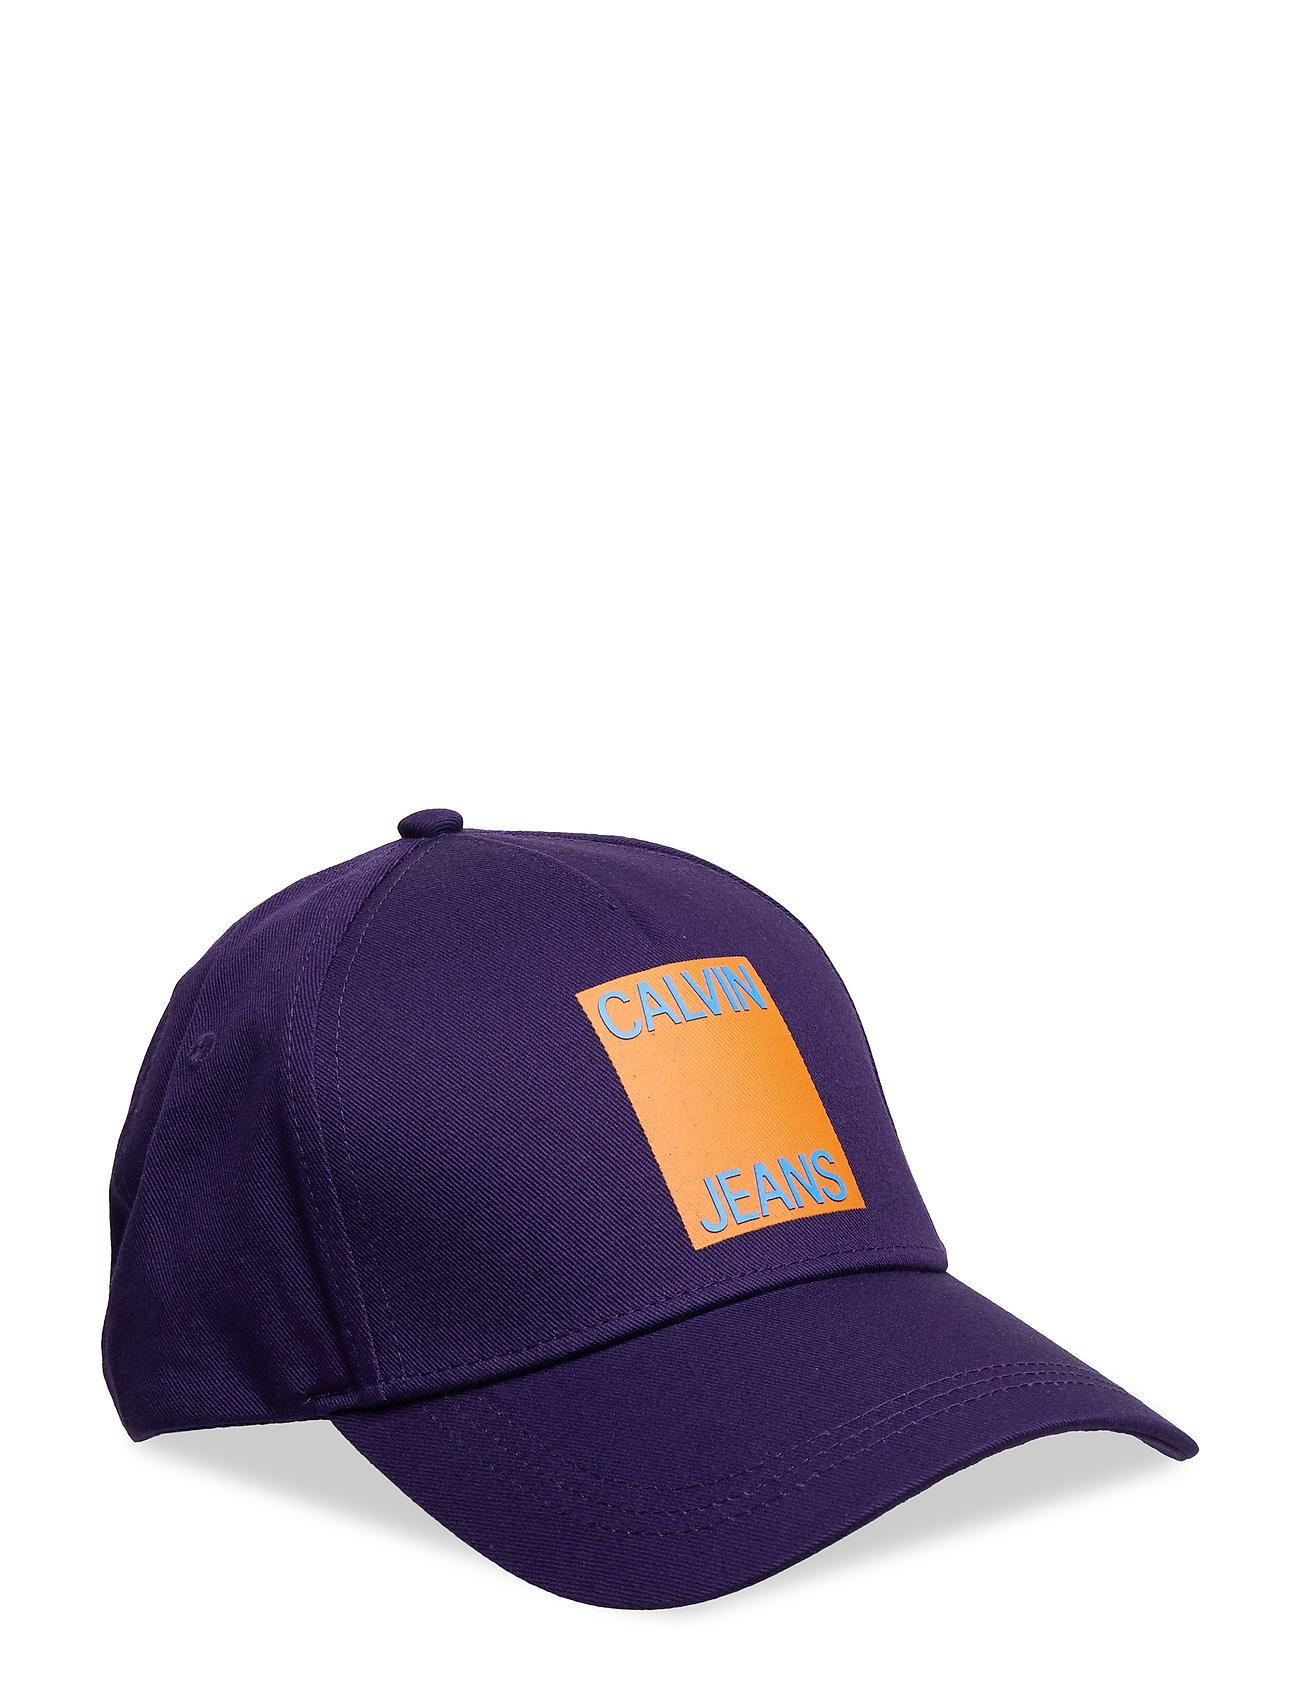 Image of J Calvin Jeans Cap Accessories Headwear Caps Lilla Calvin Klein (3094066341)